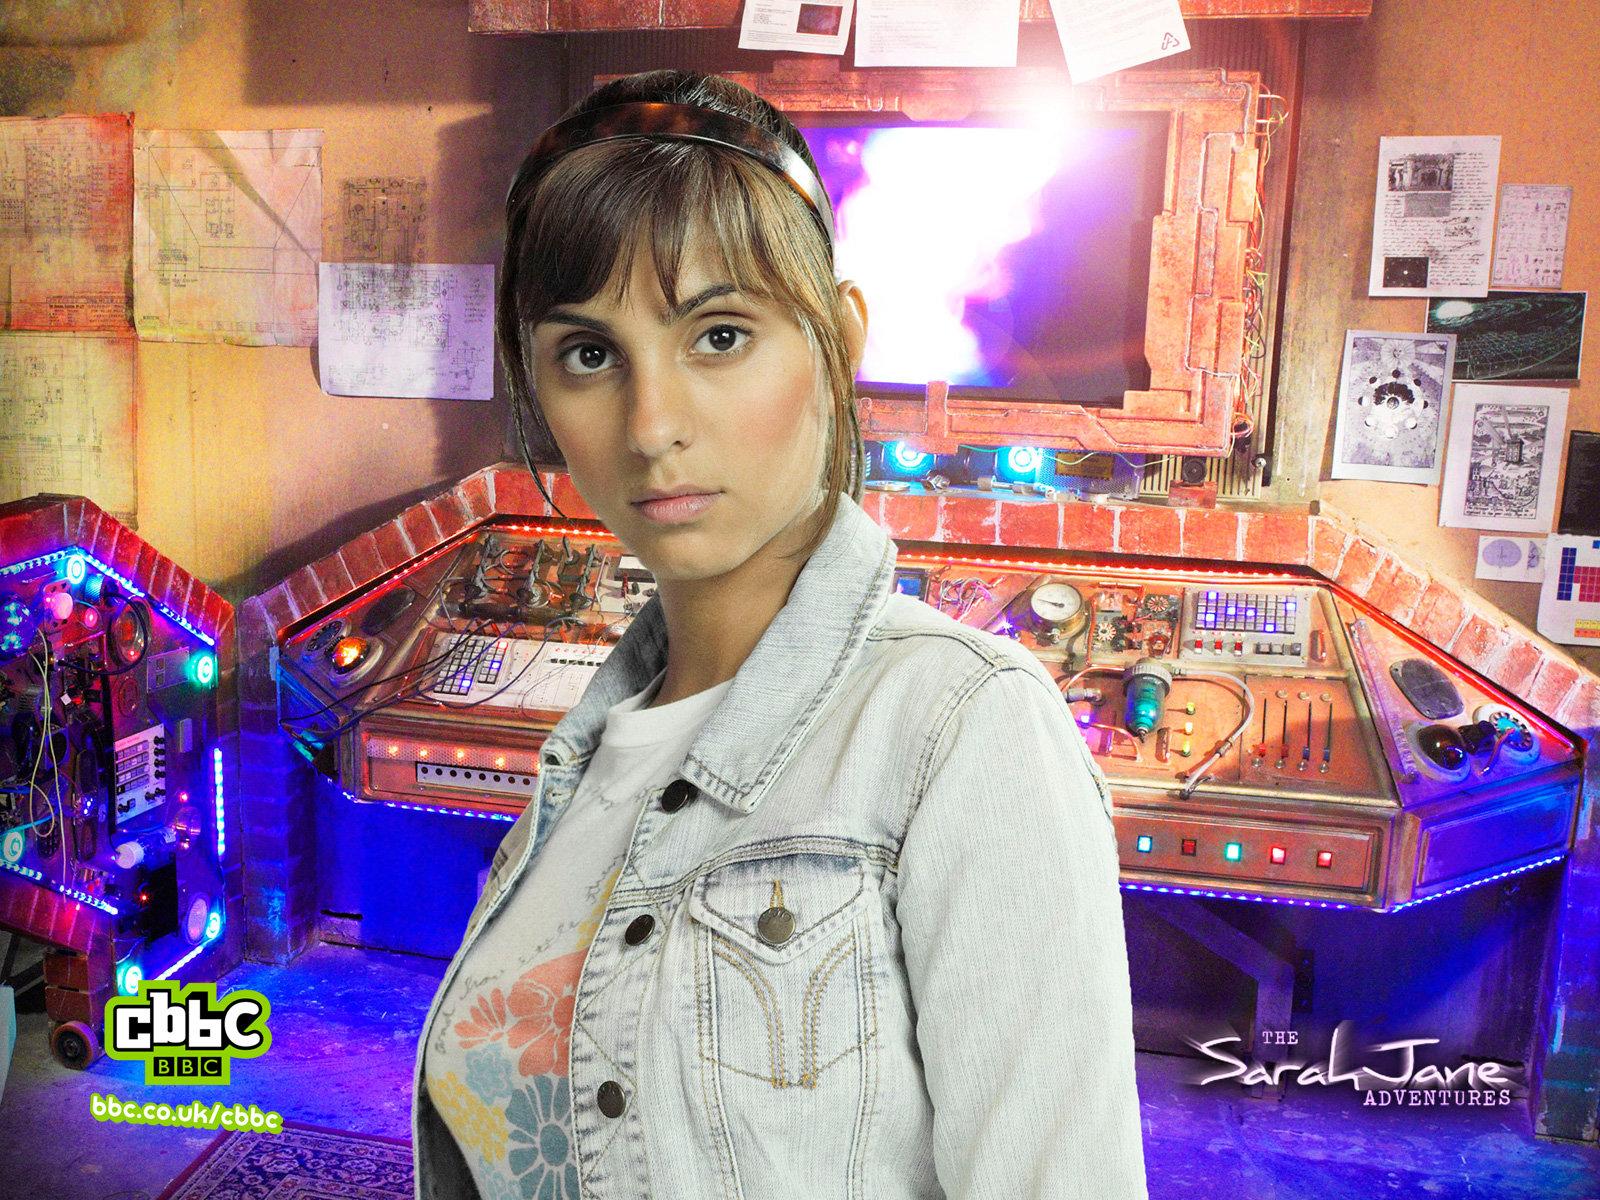 rani chandra images rani chandra wallpaper hd wallpaper and